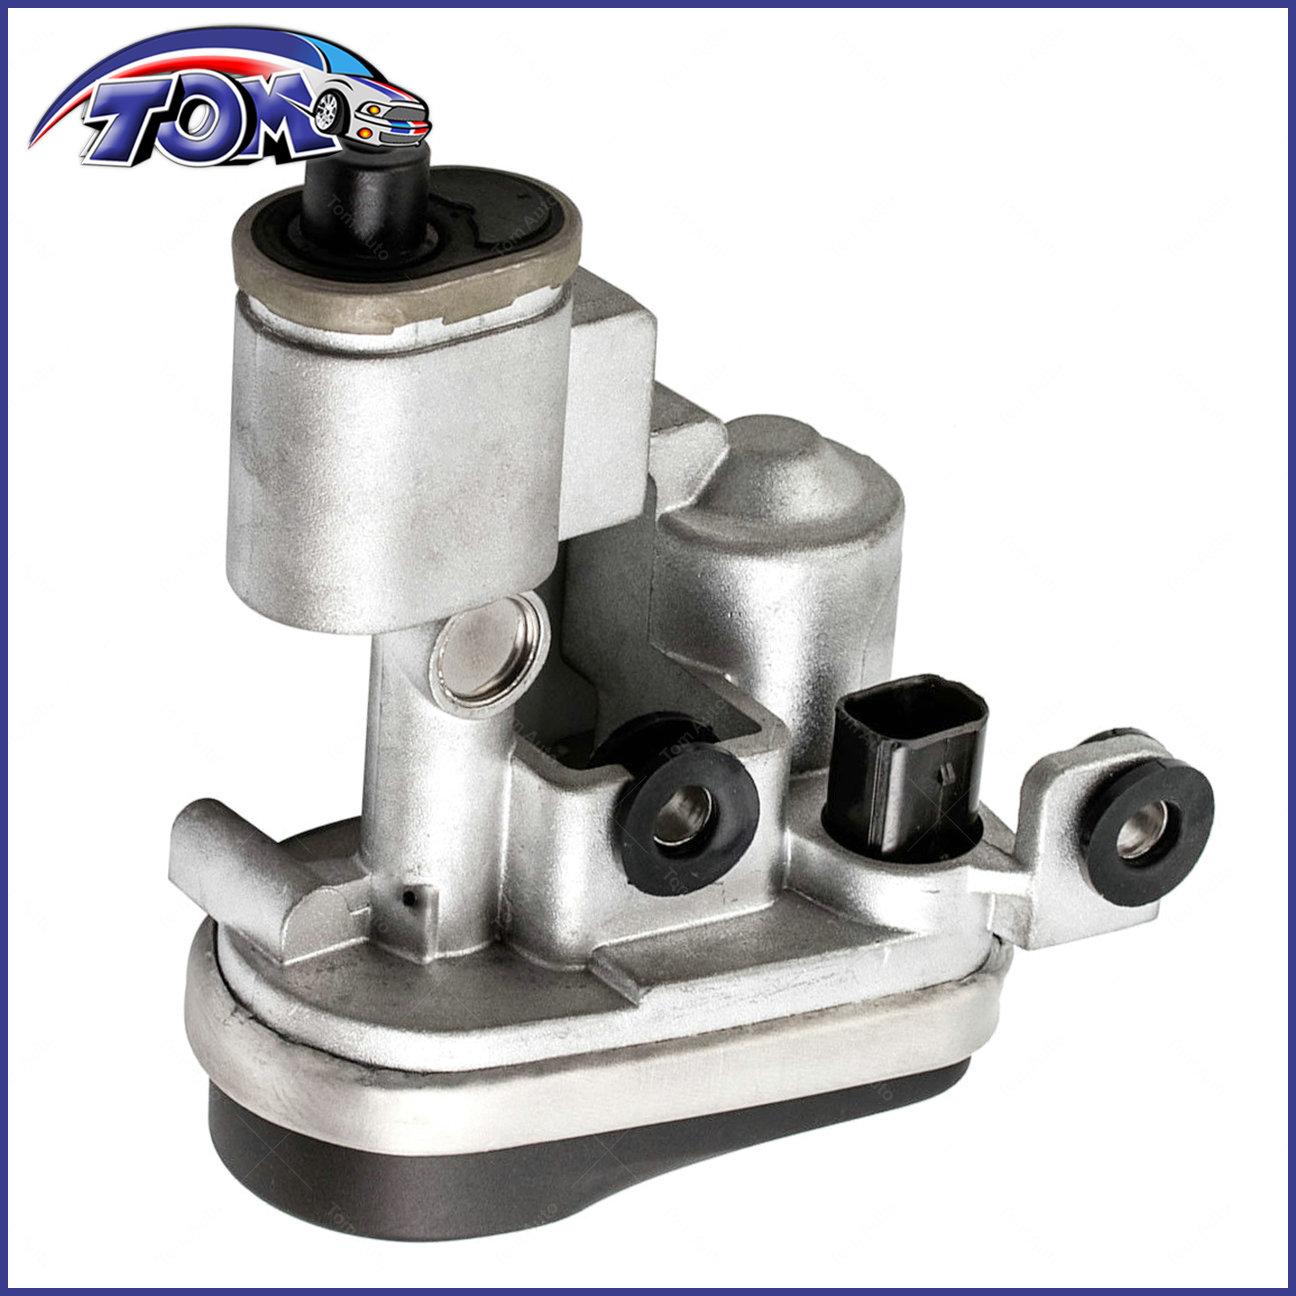 Automatic Transmission Throttle Valve Fits 05 09 Dodge Ram 2500609 48re Actuator Wiring Diagram 045